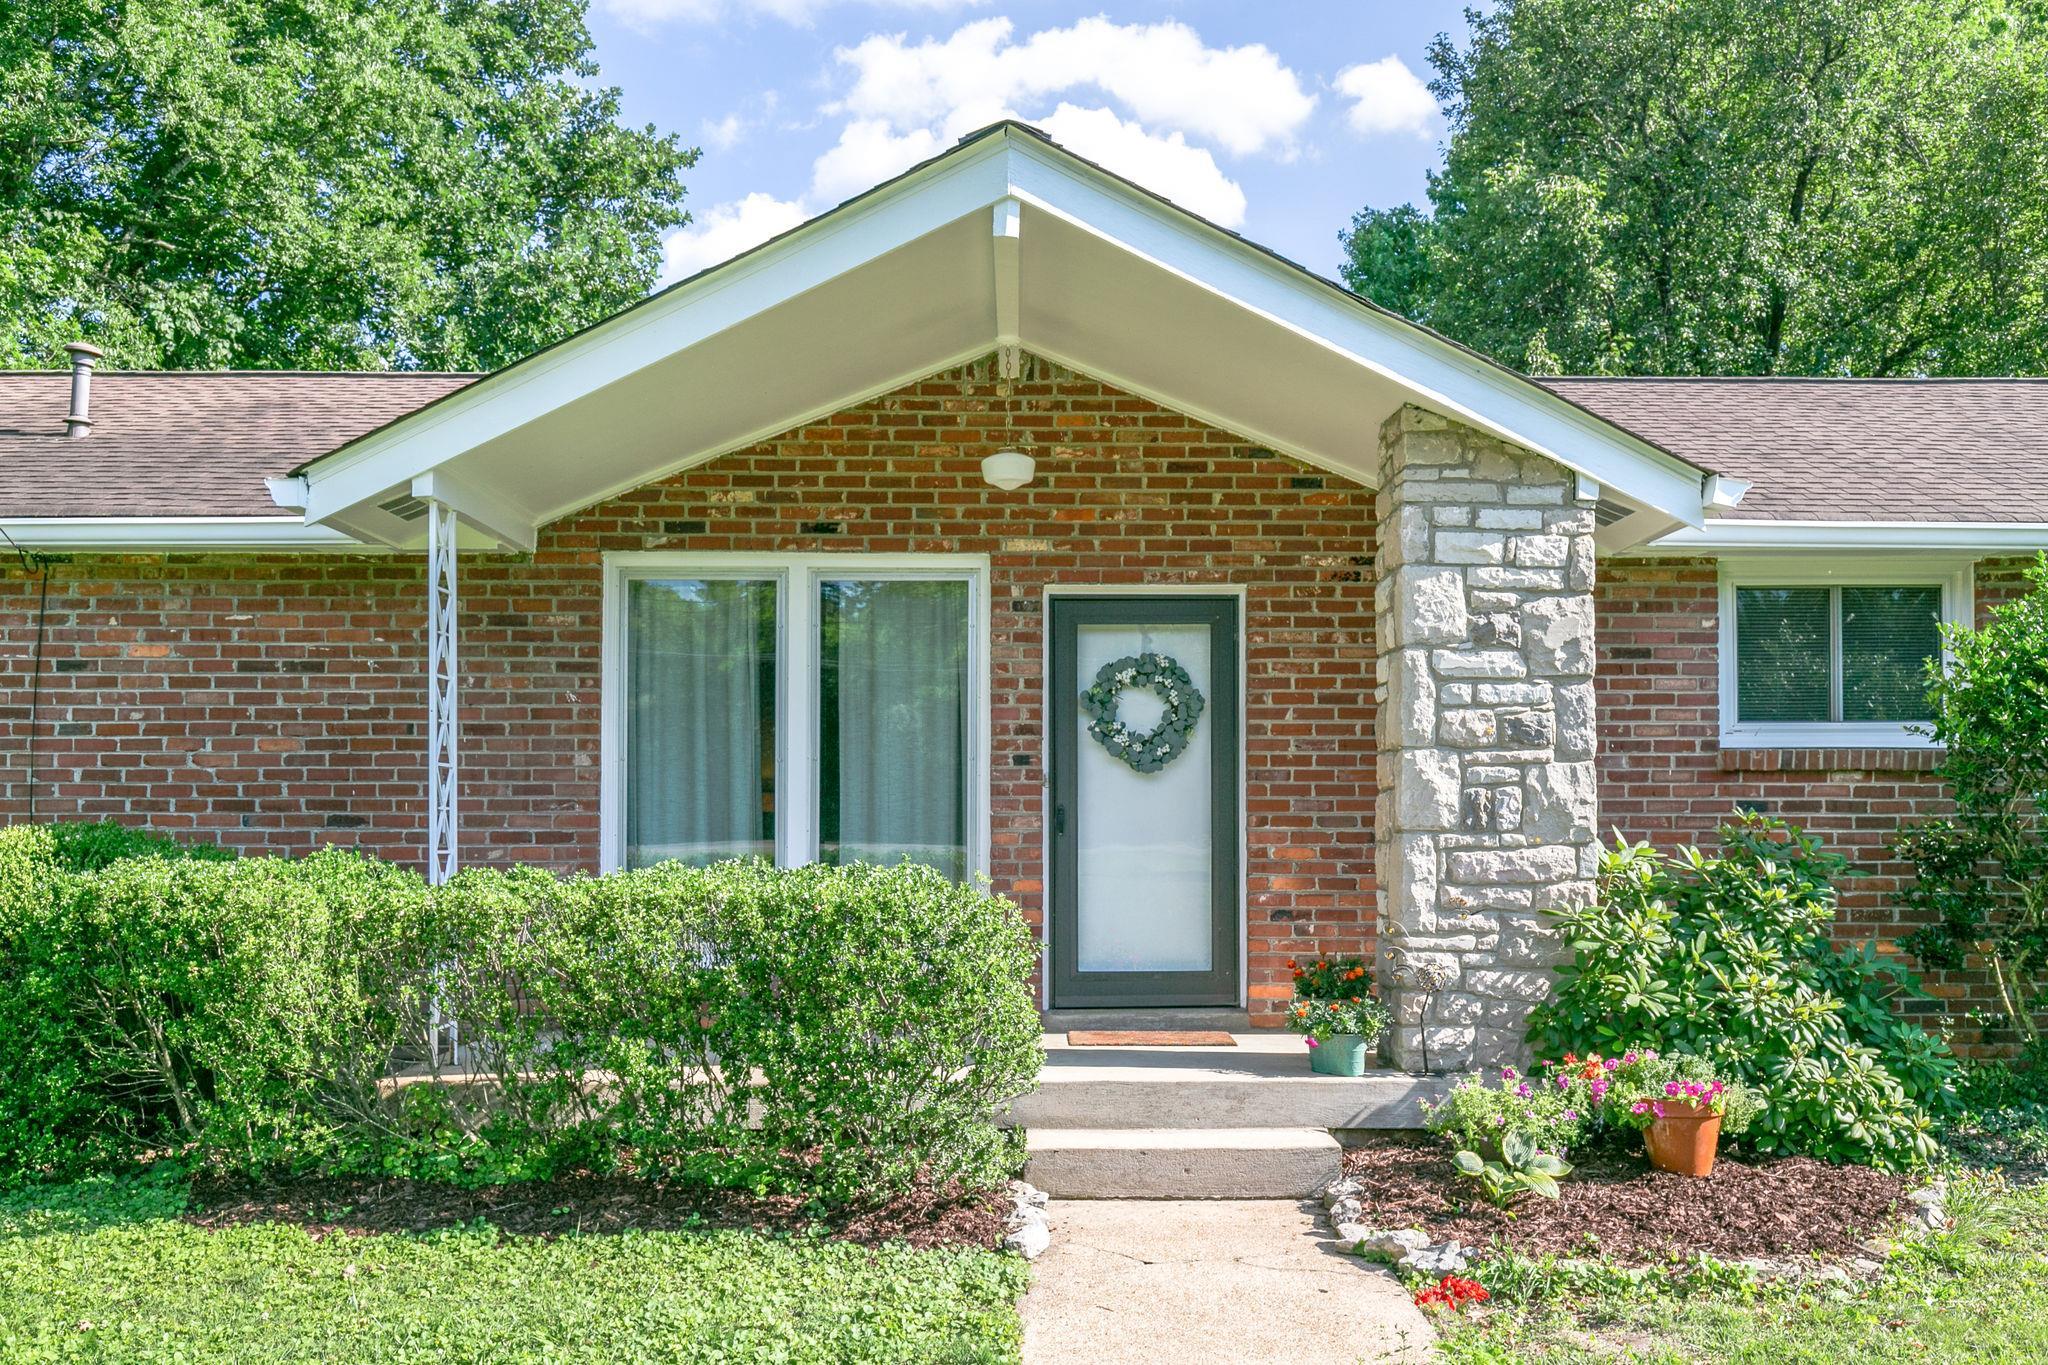 1935 Berrys Chapel Ct, Franklin, TN 37069 - Franklin, TN real estate listing